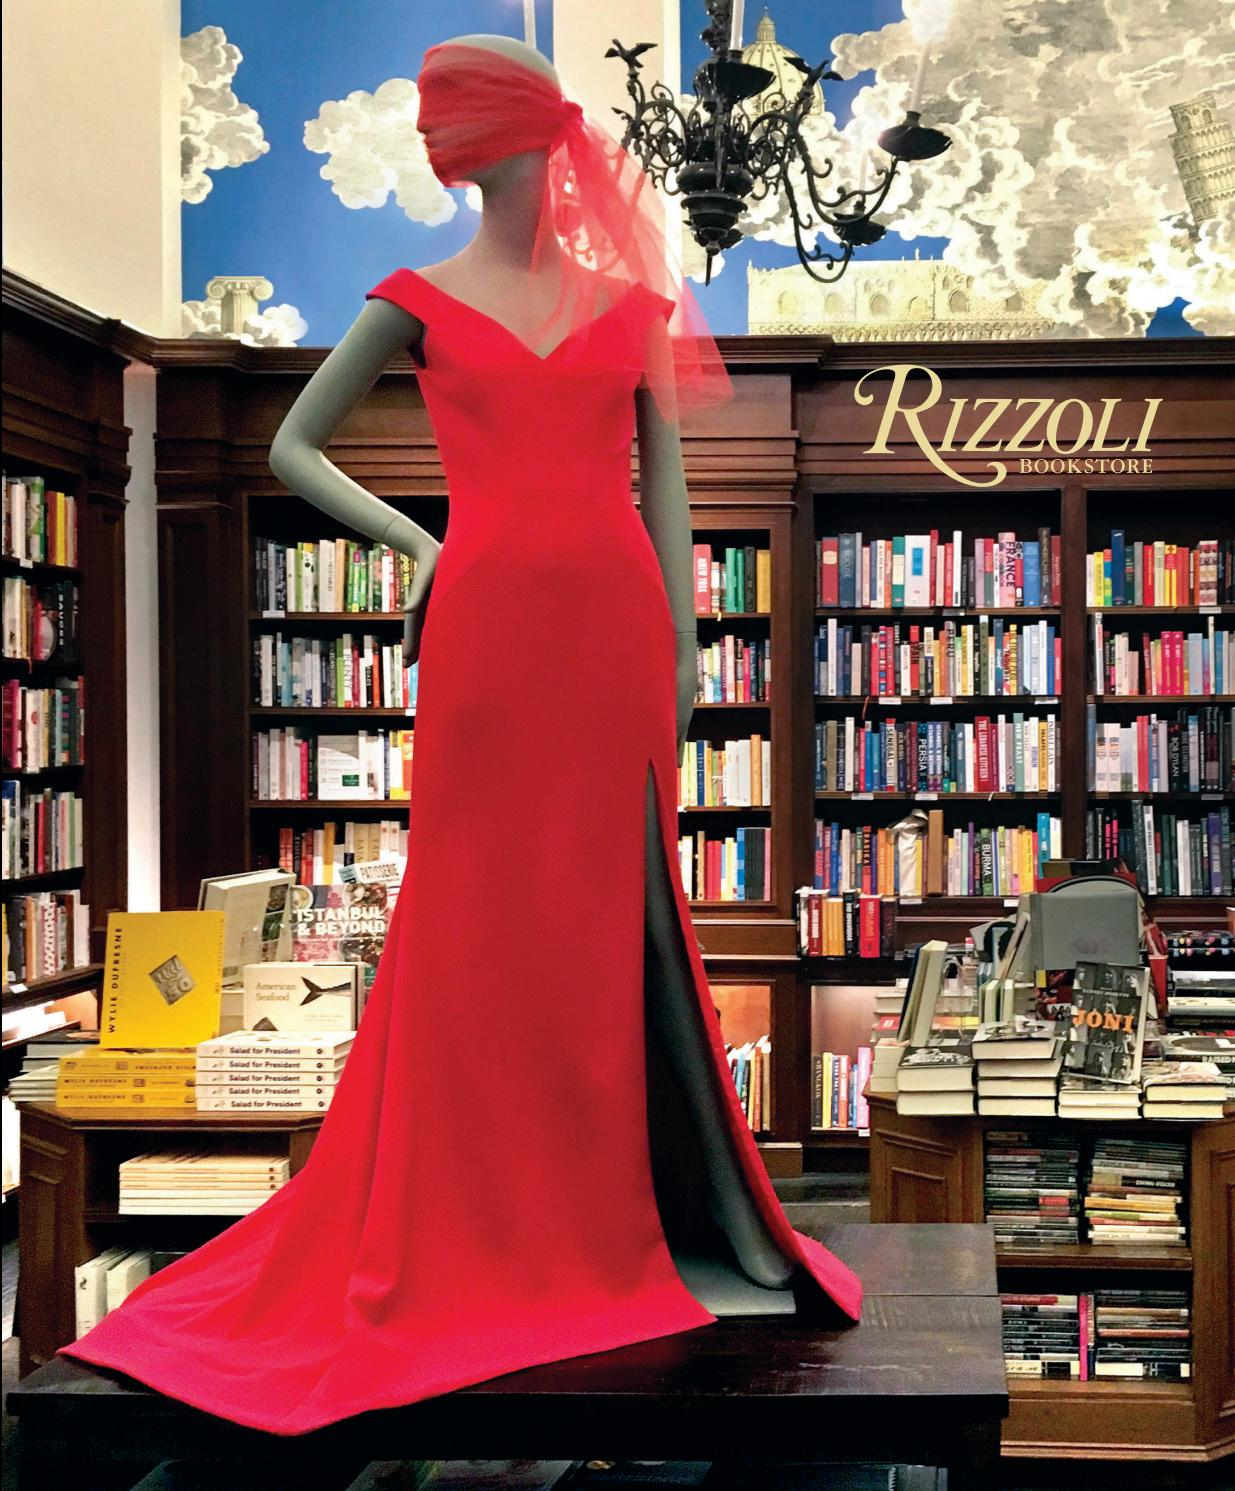 bc23291aac3d Rizzoli Bookstore Holiday Catalog 2018 by Rizzoli International ...